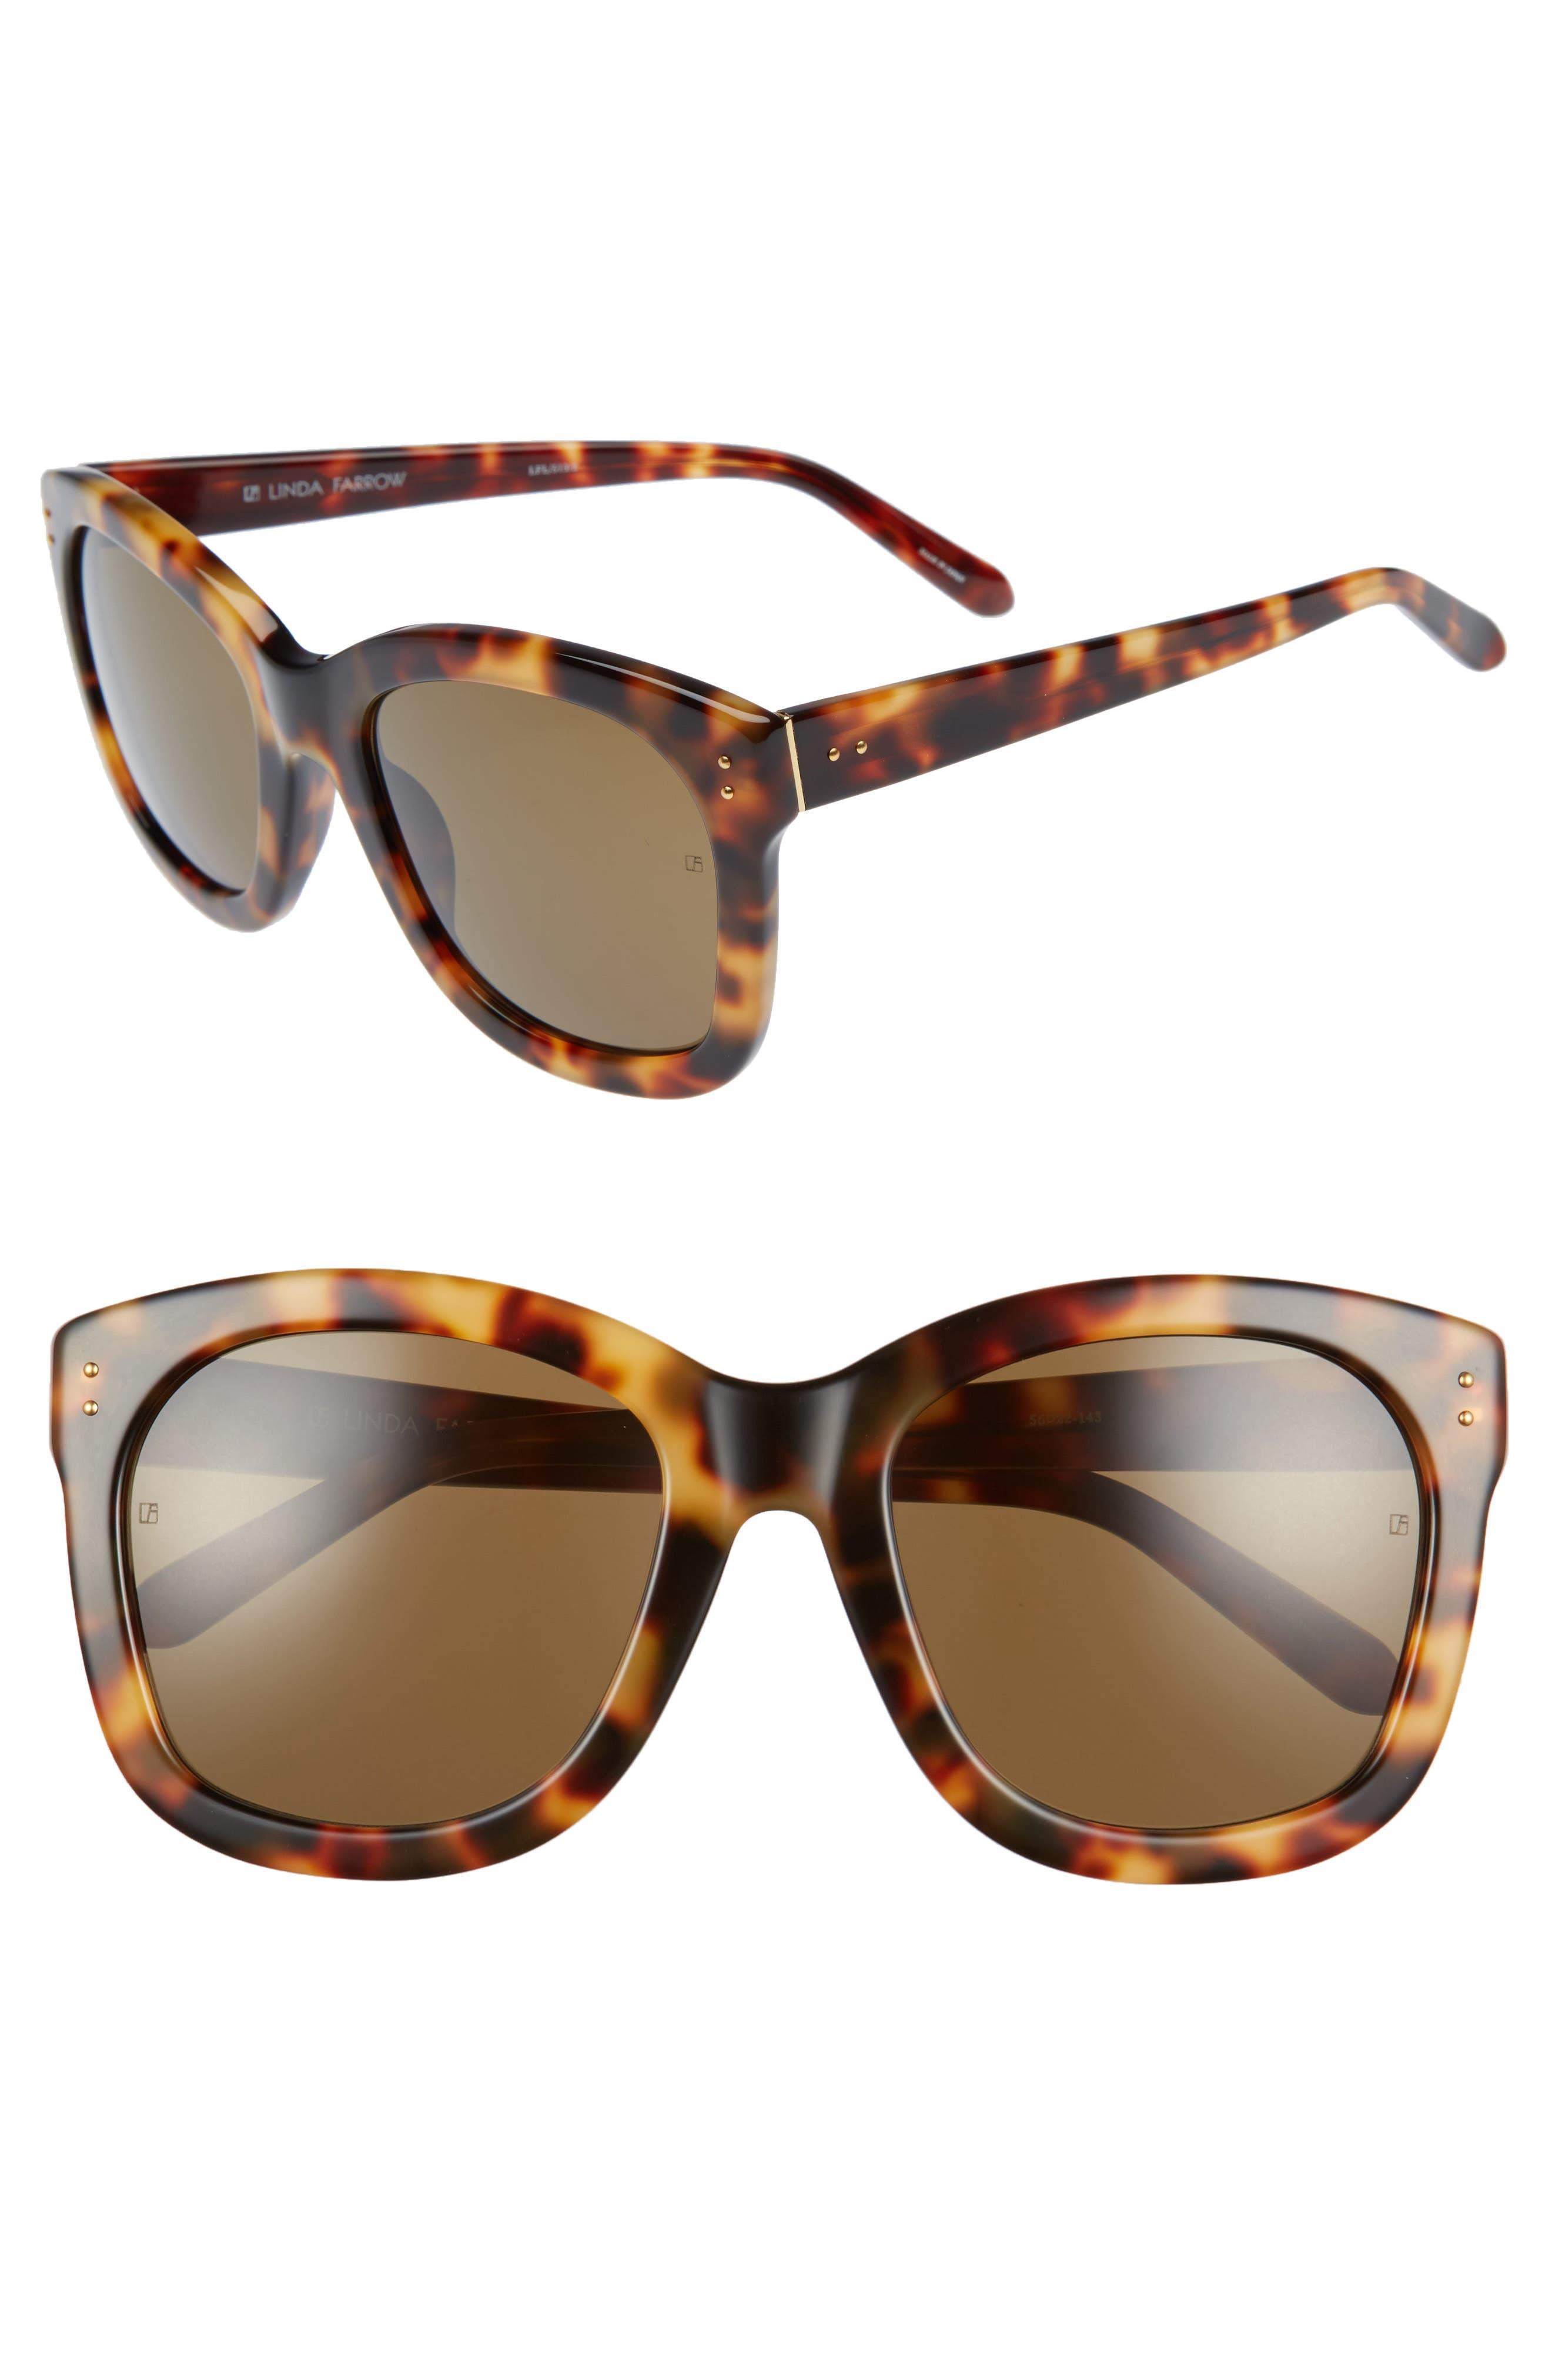 Main Image - Linda Farrow 56mm Angular Sunglasses